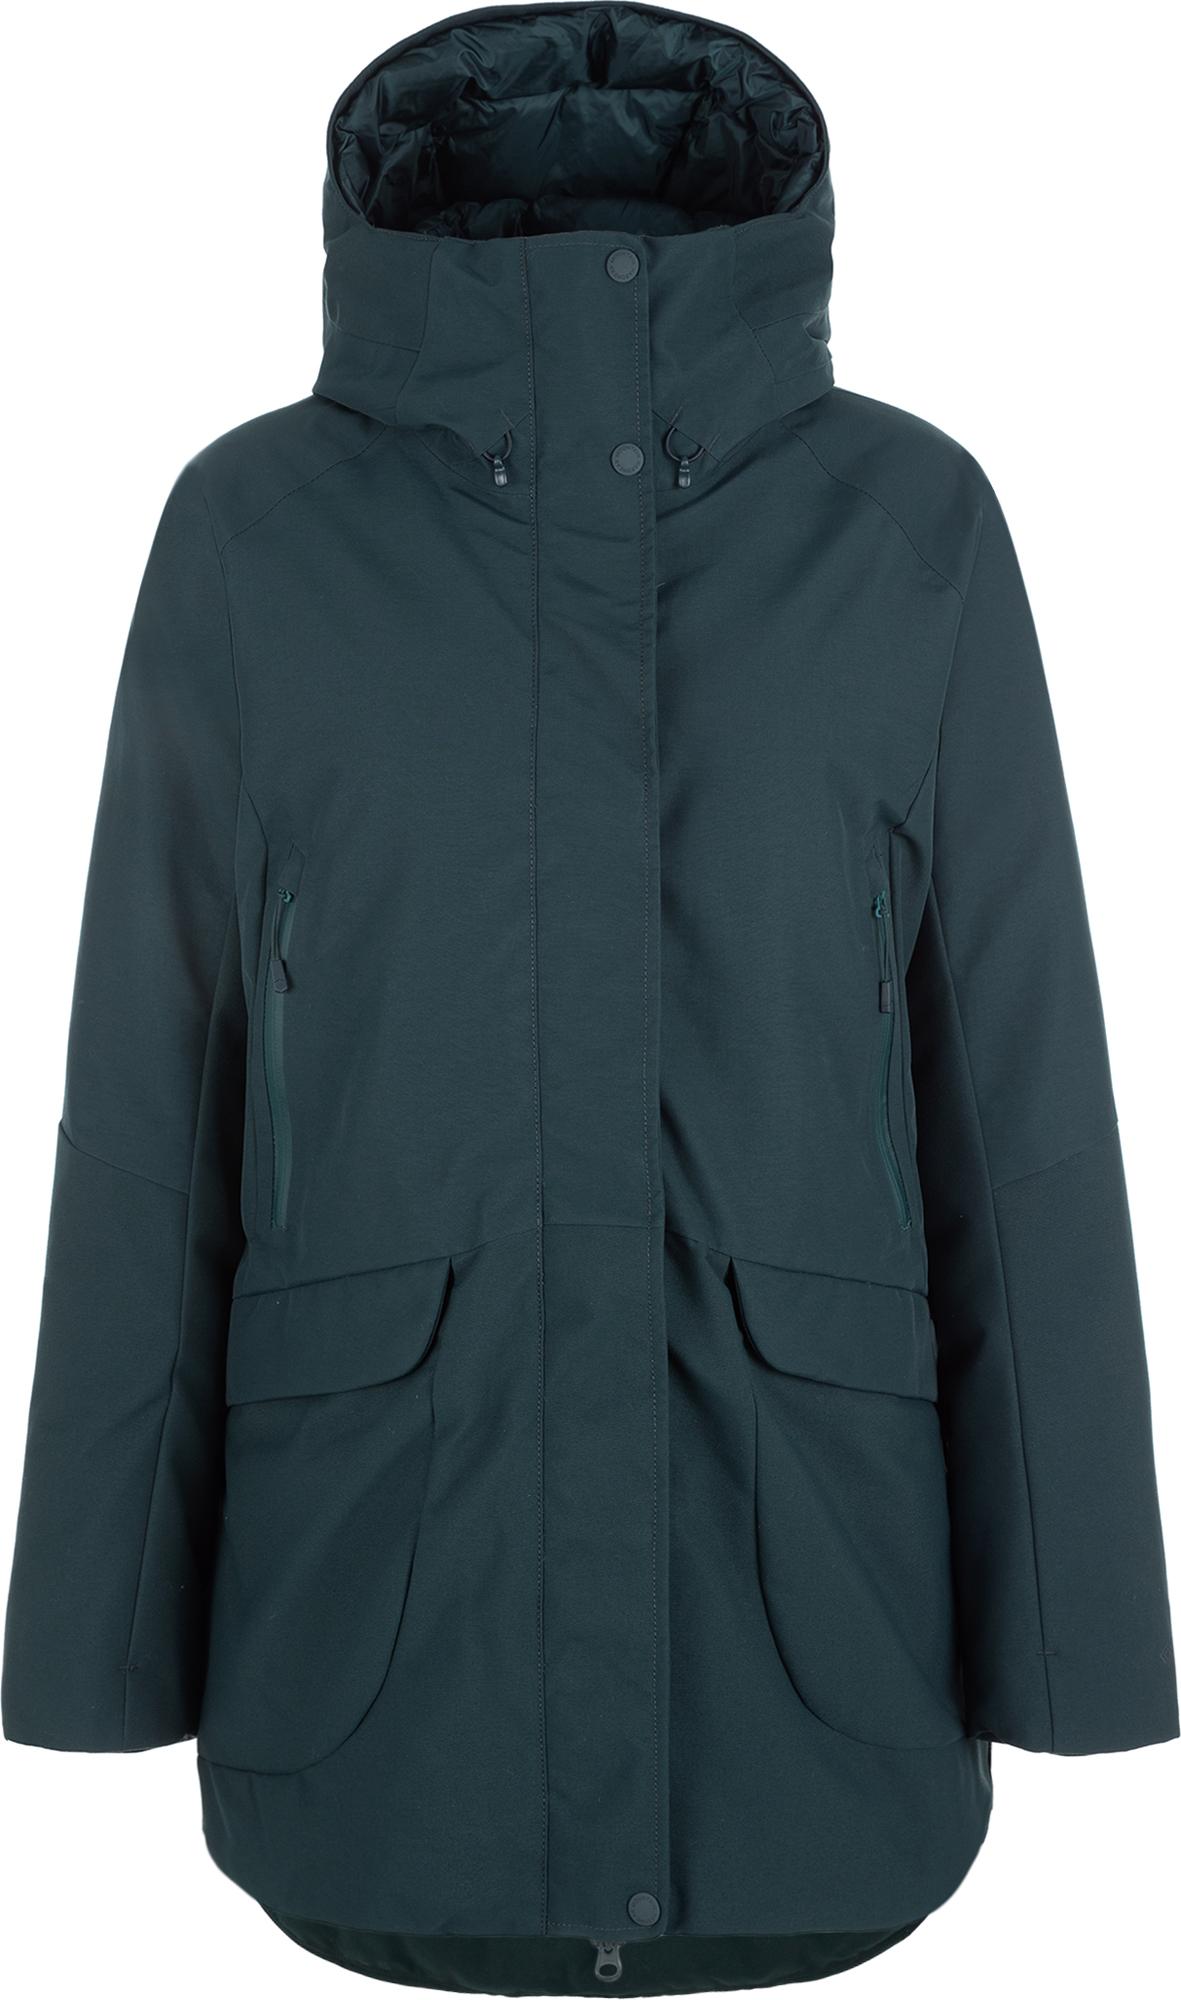 Mountain Hardwear Куртка пуховая женская Mountain Hardwear Summit Shadow™ Gore-Tex®, размер 48 цена